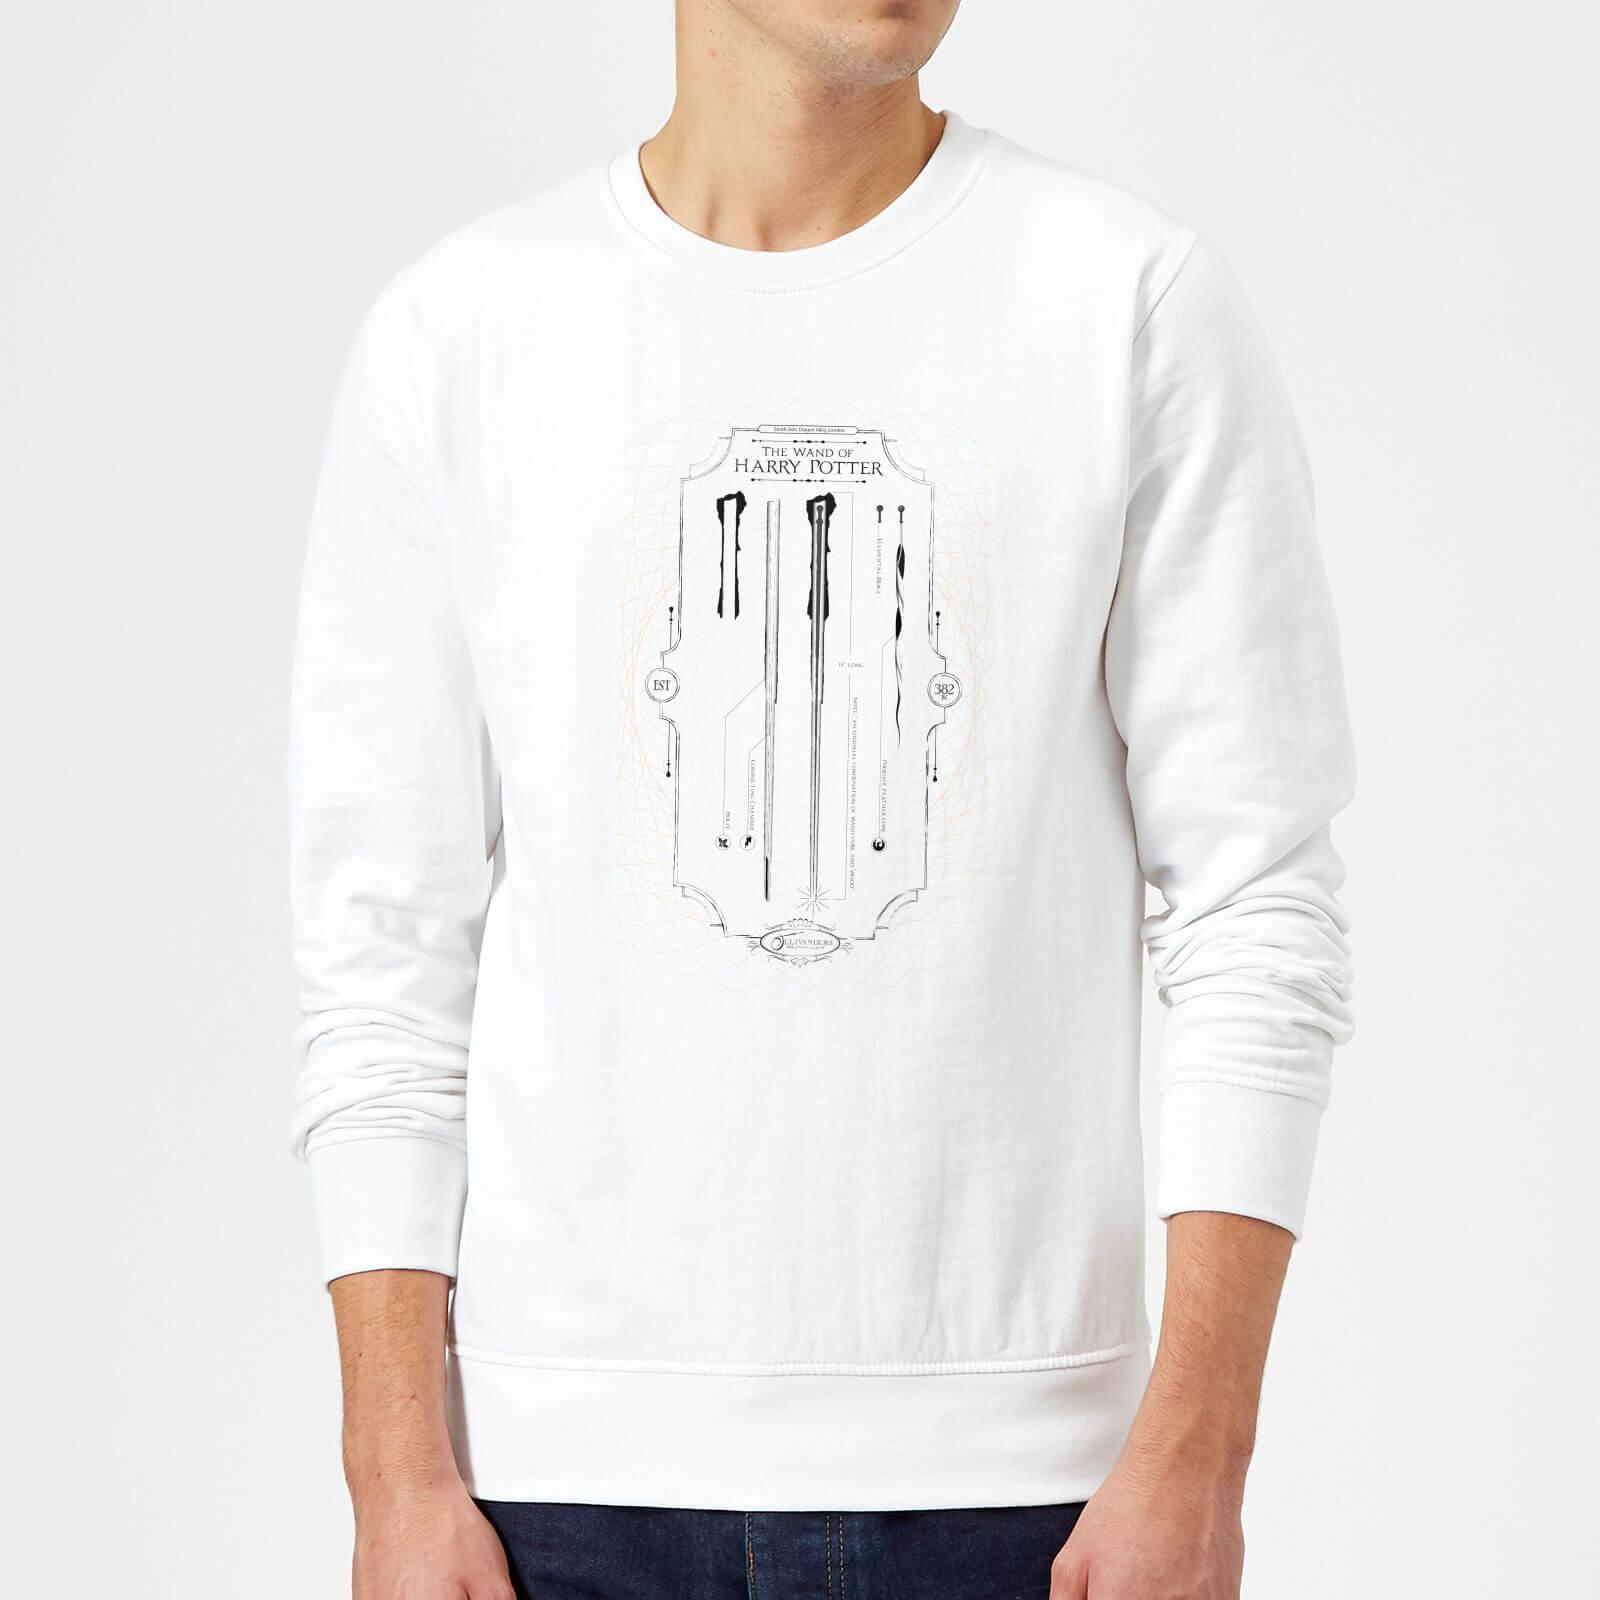 Harry Potter Wand Of Harry Potter Sweatshirt - White - L - Weiß